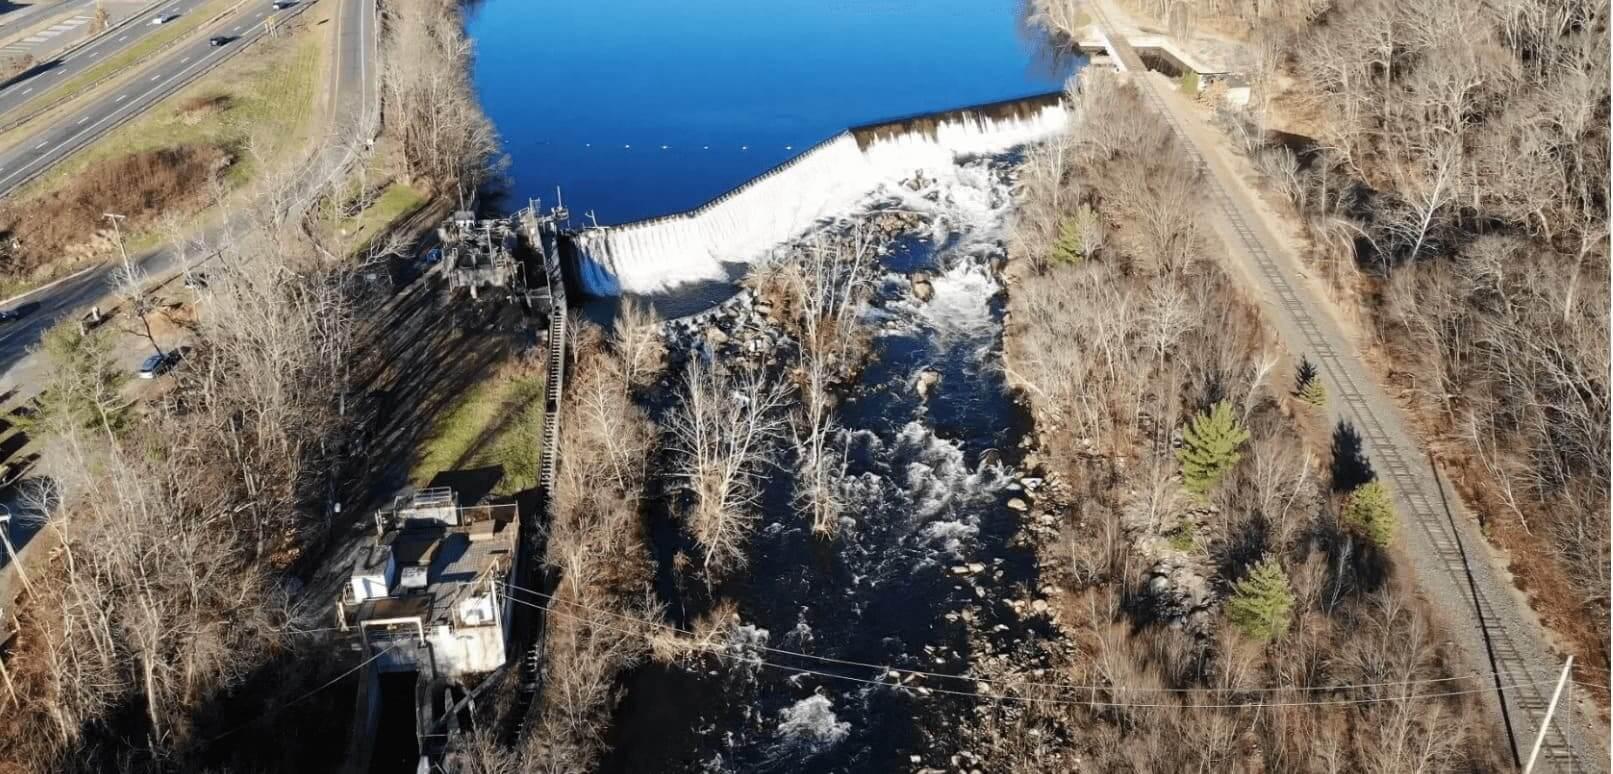 Kinneytown Dam and Fish Ladder